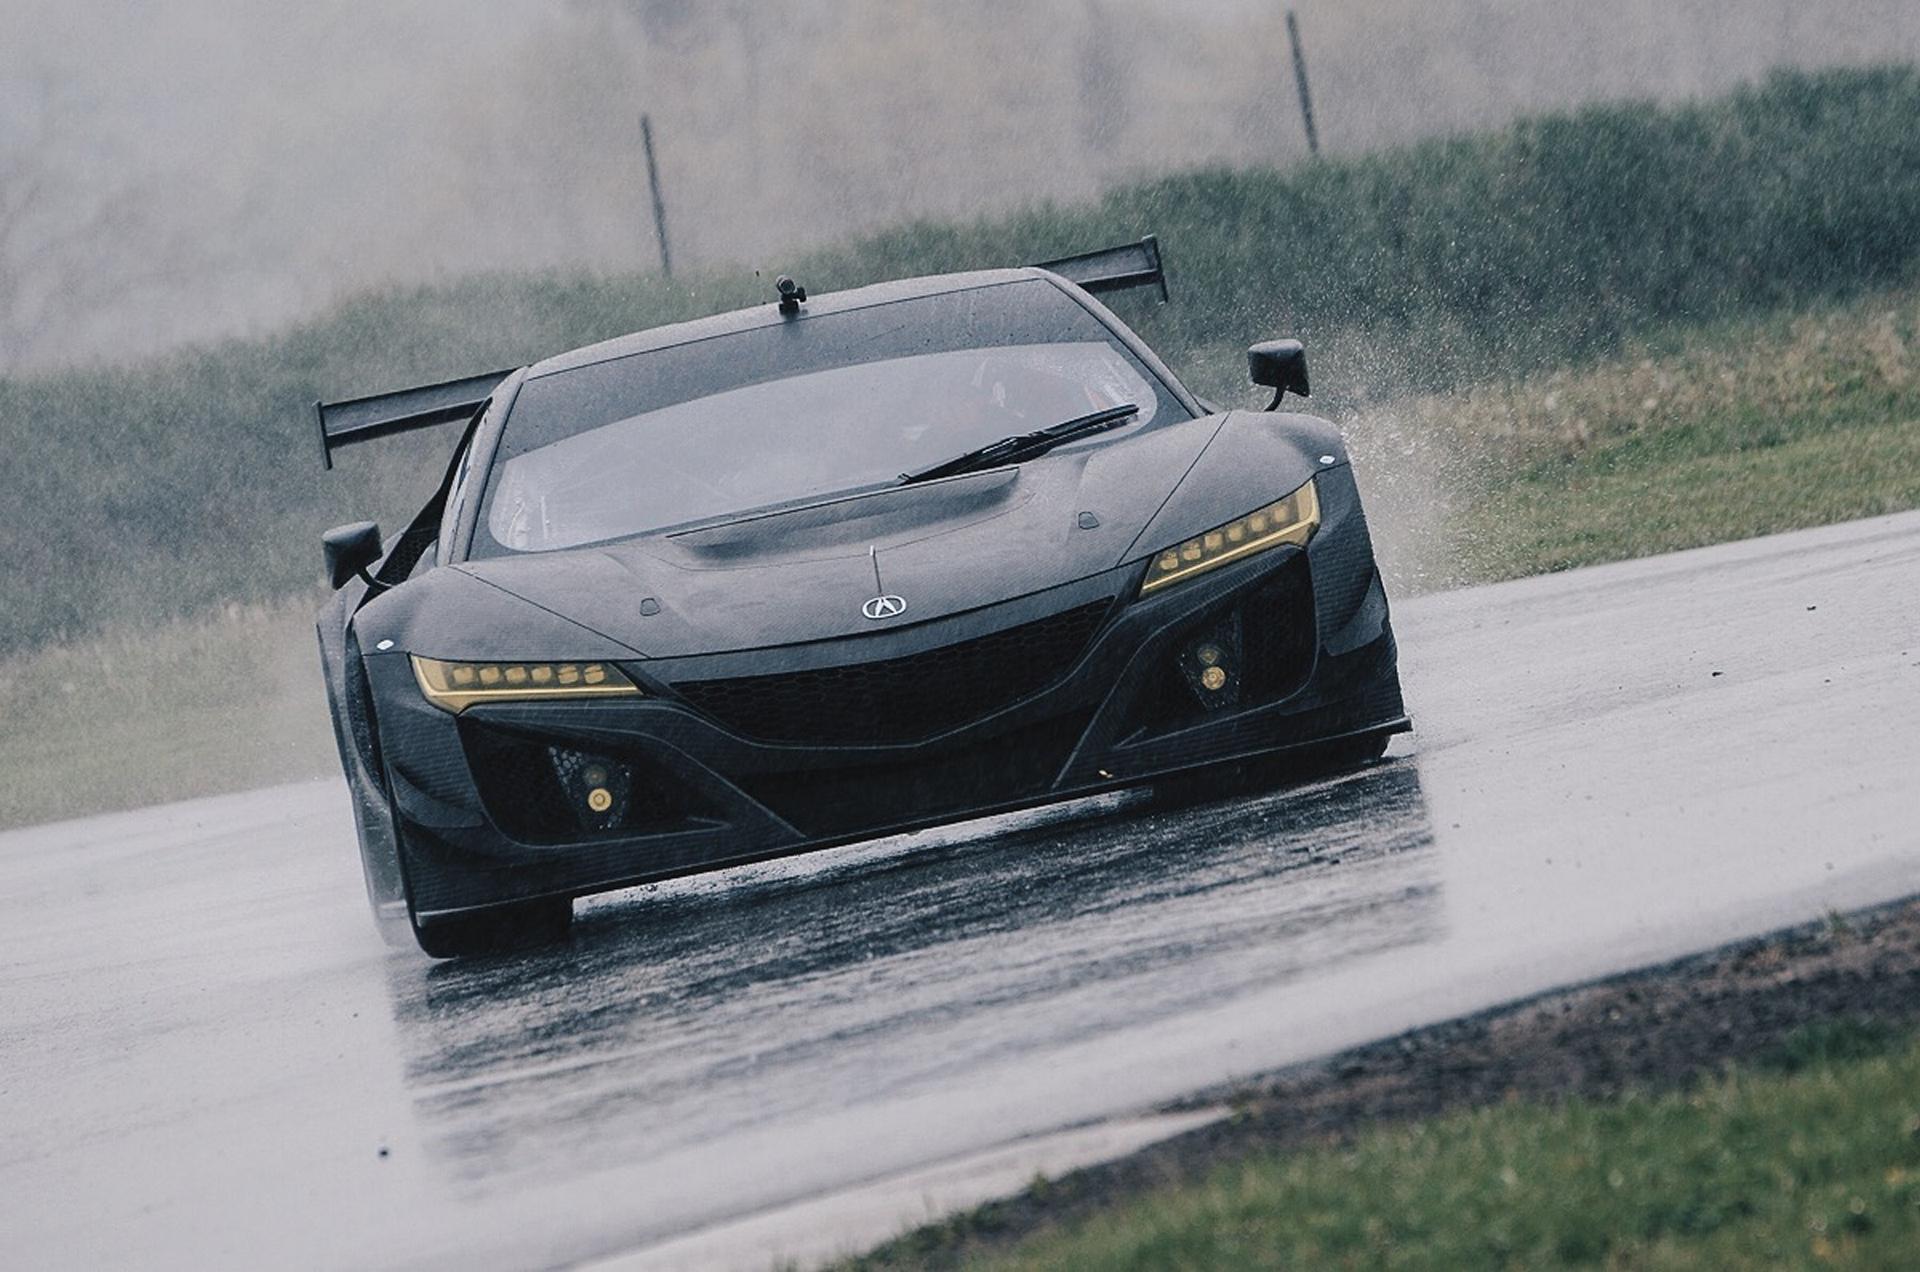 Acura NSX GT3 Racecar © Honda Motor Co., Ltd.